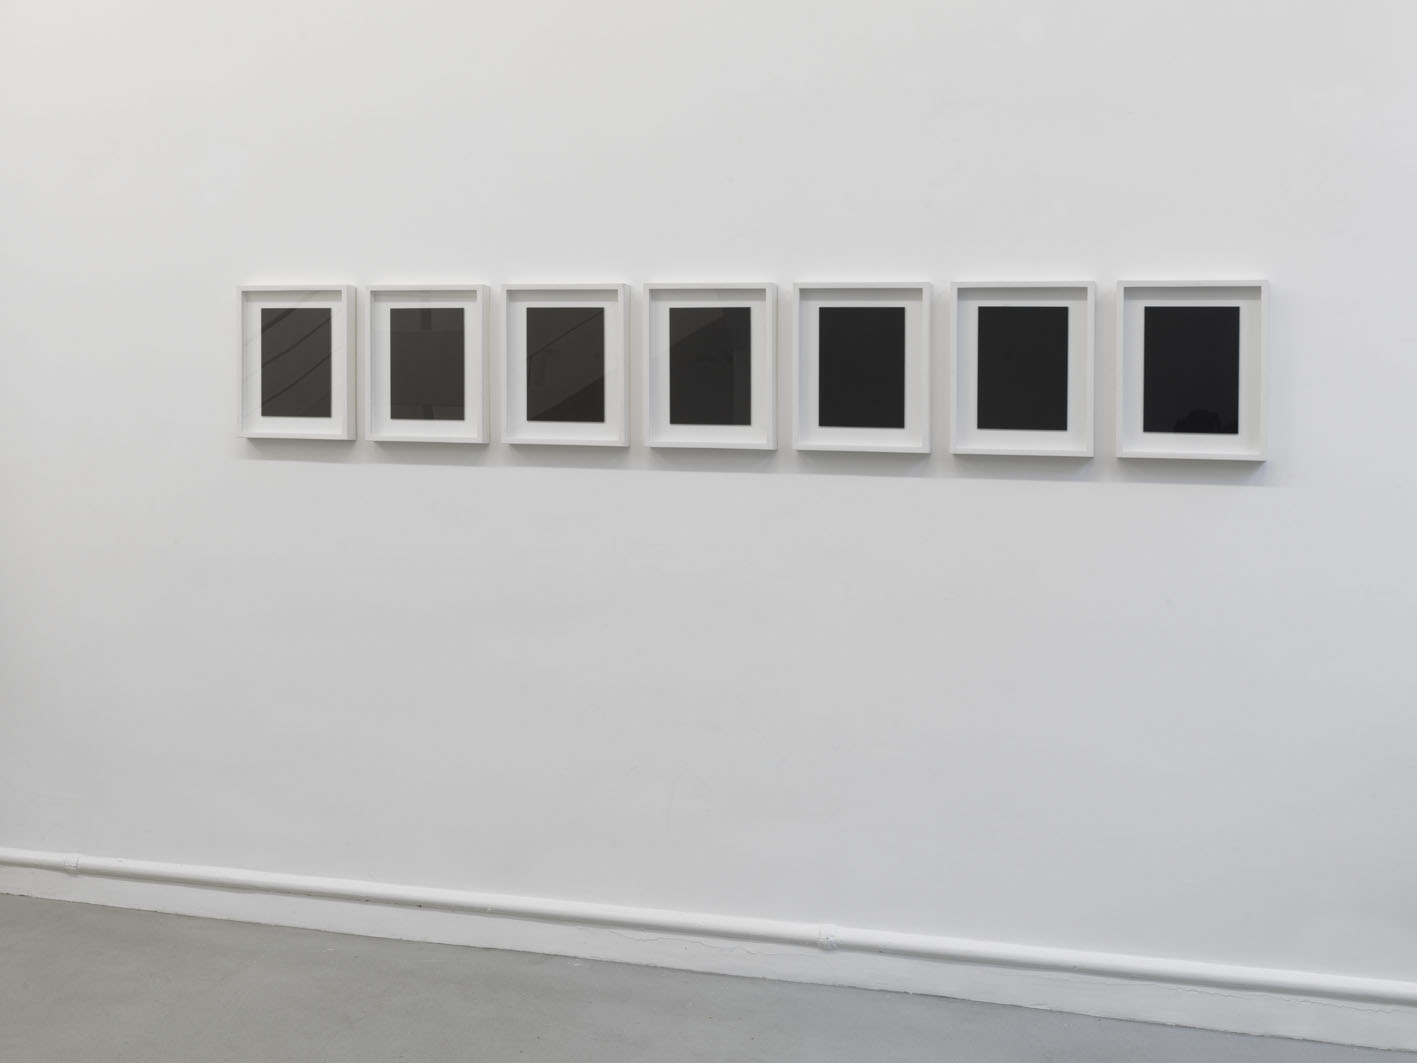 Stefan Brüggemann Seven Reversed Mirrors, 2010